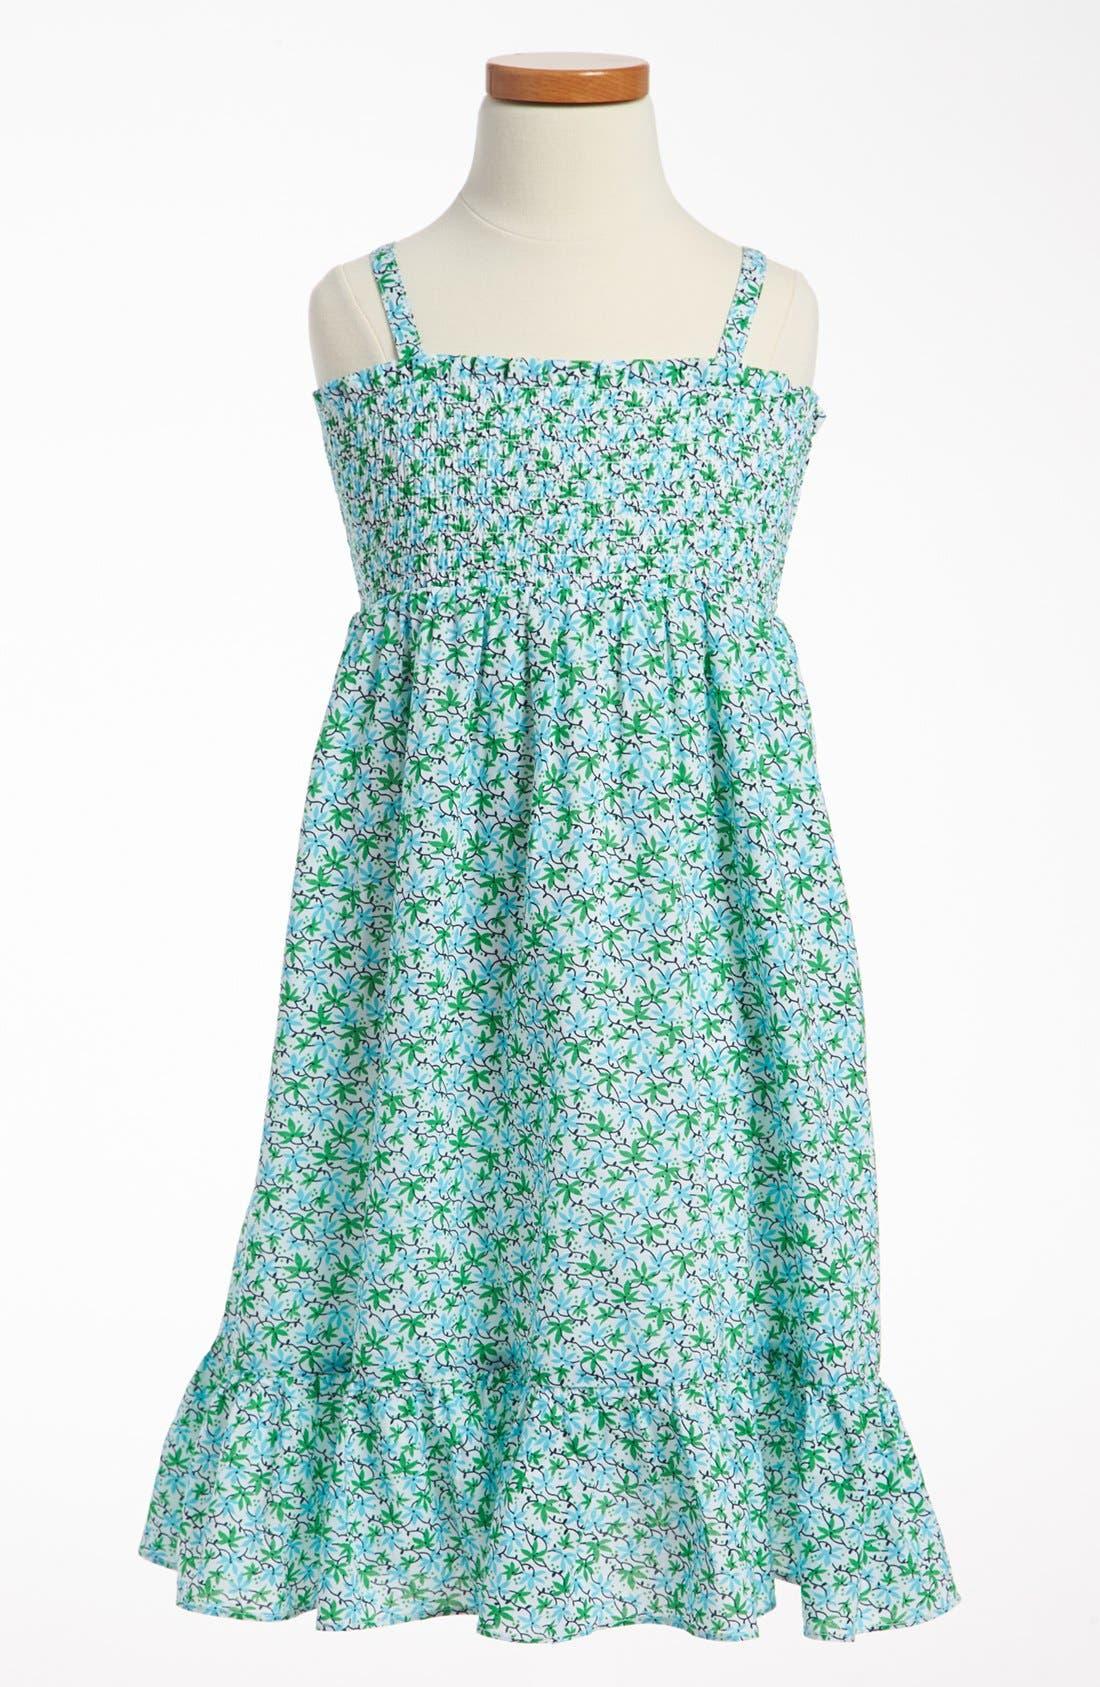 Alternate Image 1 Selected - Tucker + Tate 'Laurel' Dress (Big Girls)